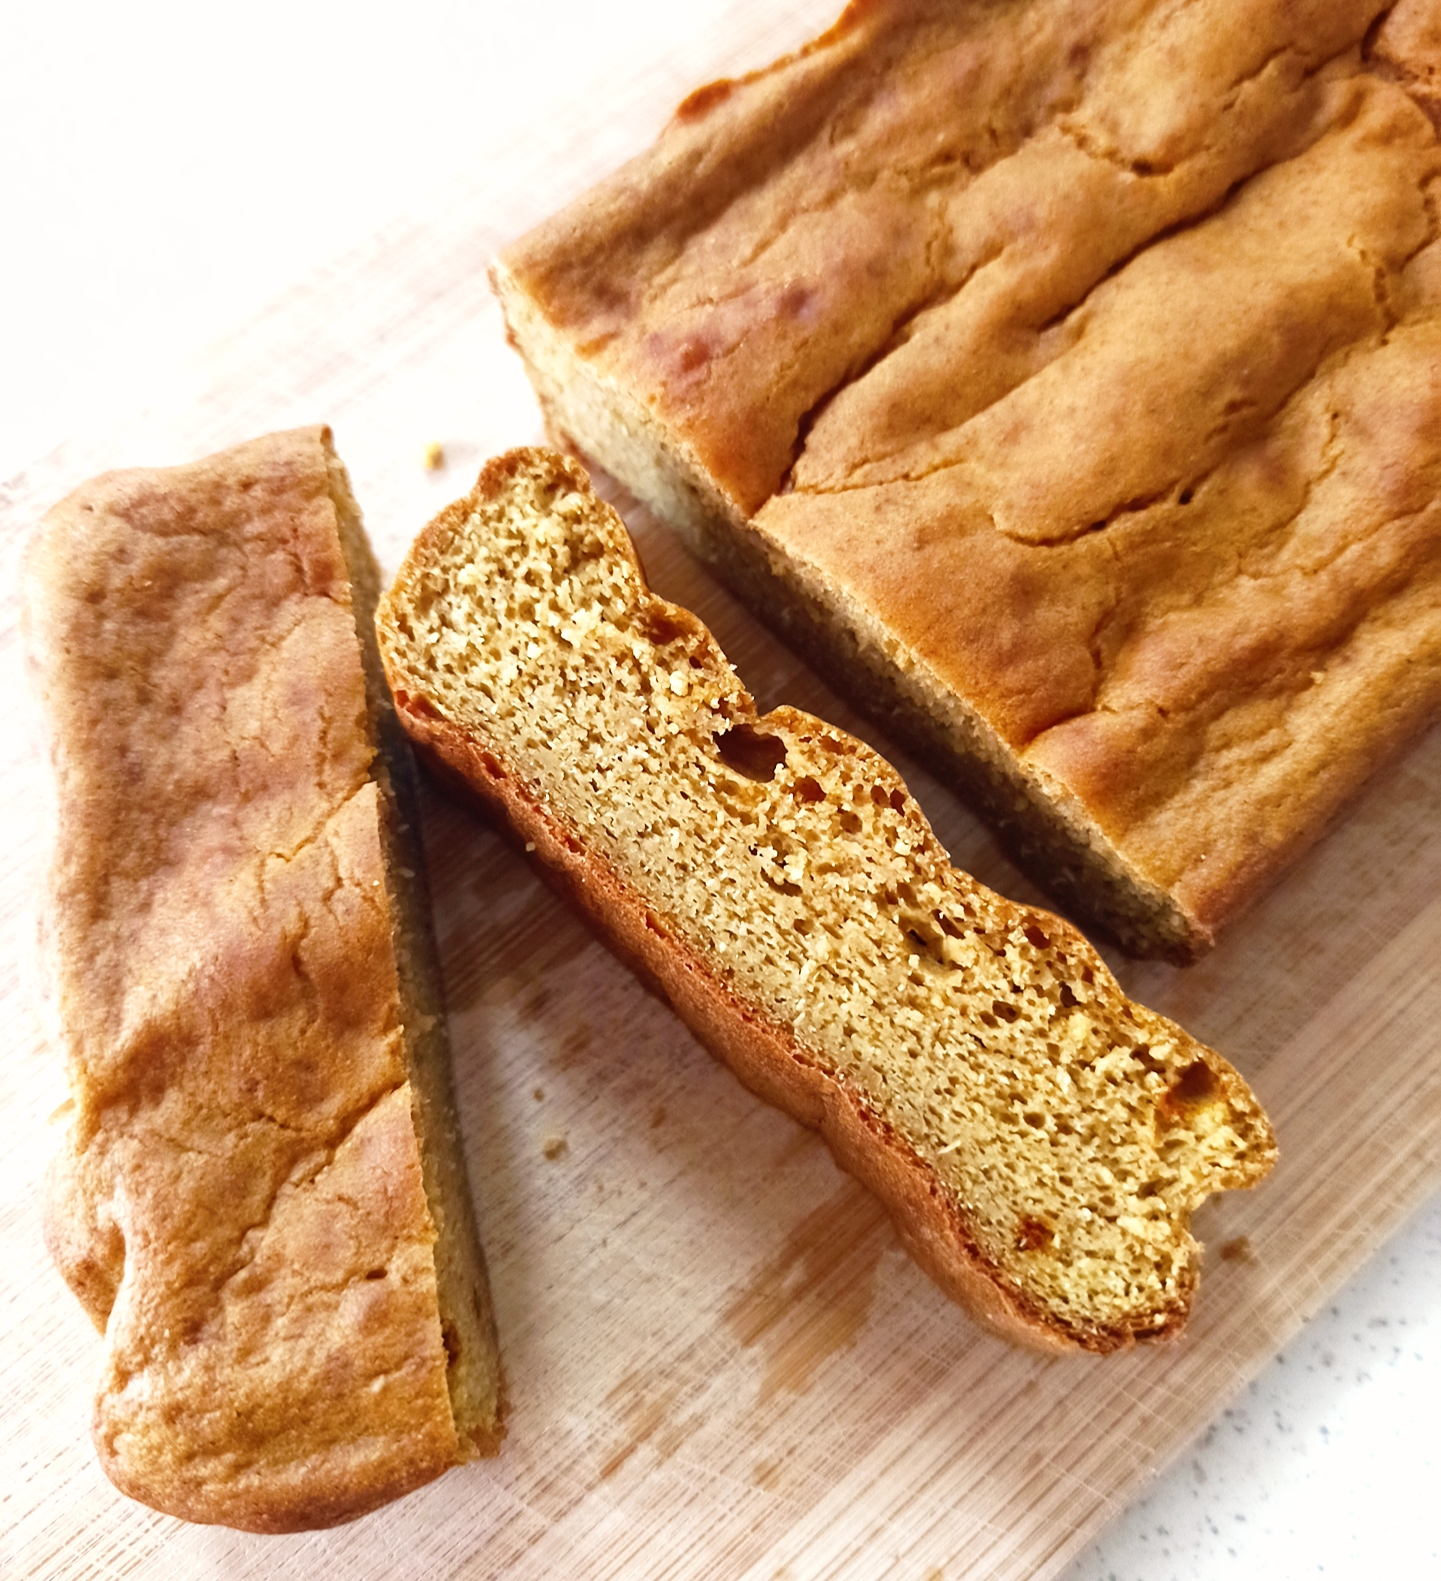 Gluten-free vegan chickpea bread